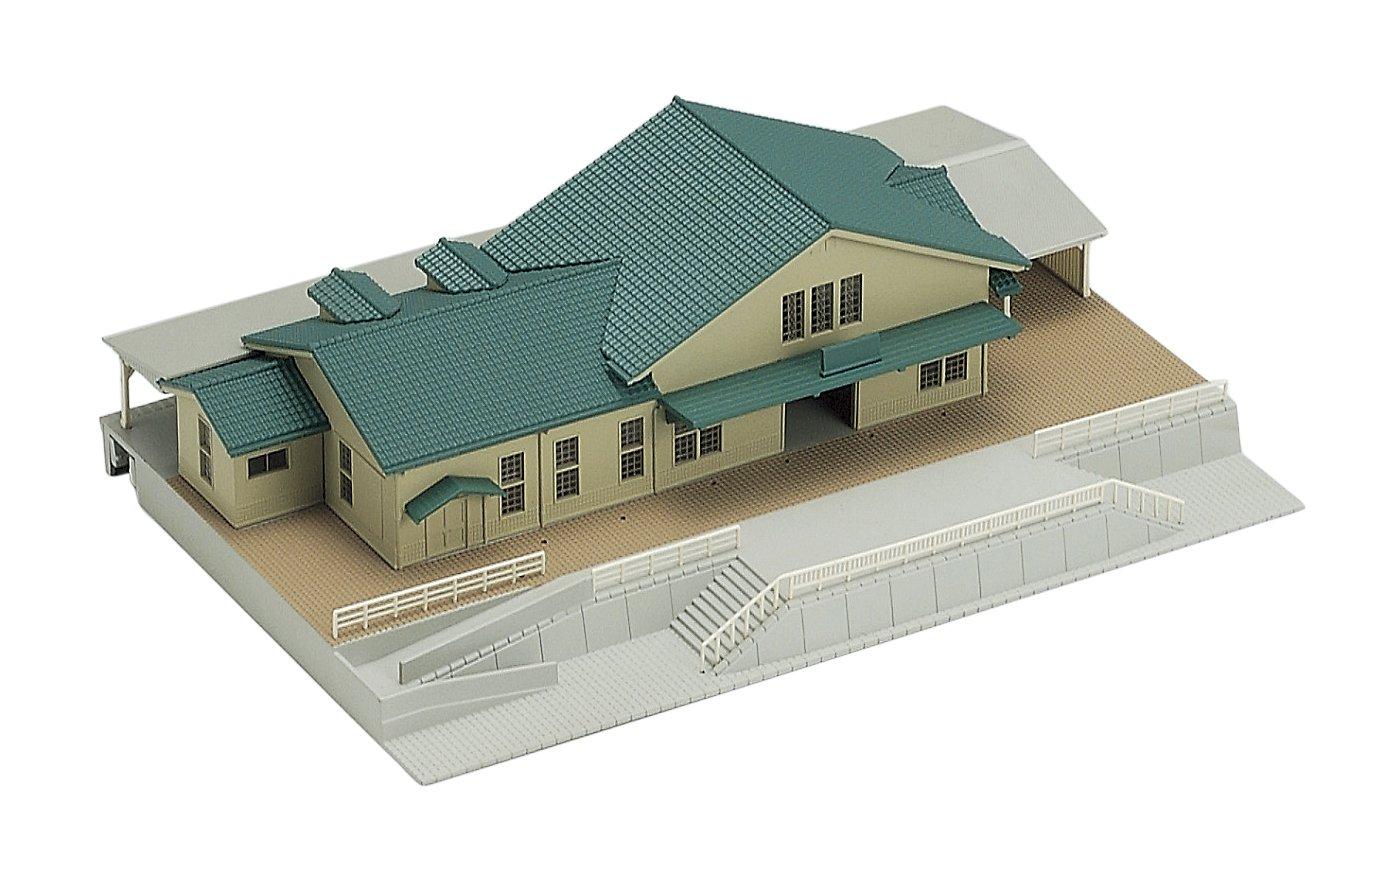 KATO Nゲージ 近郊形地上駅舎 23-211 鉄道模型用品 B002OB863G